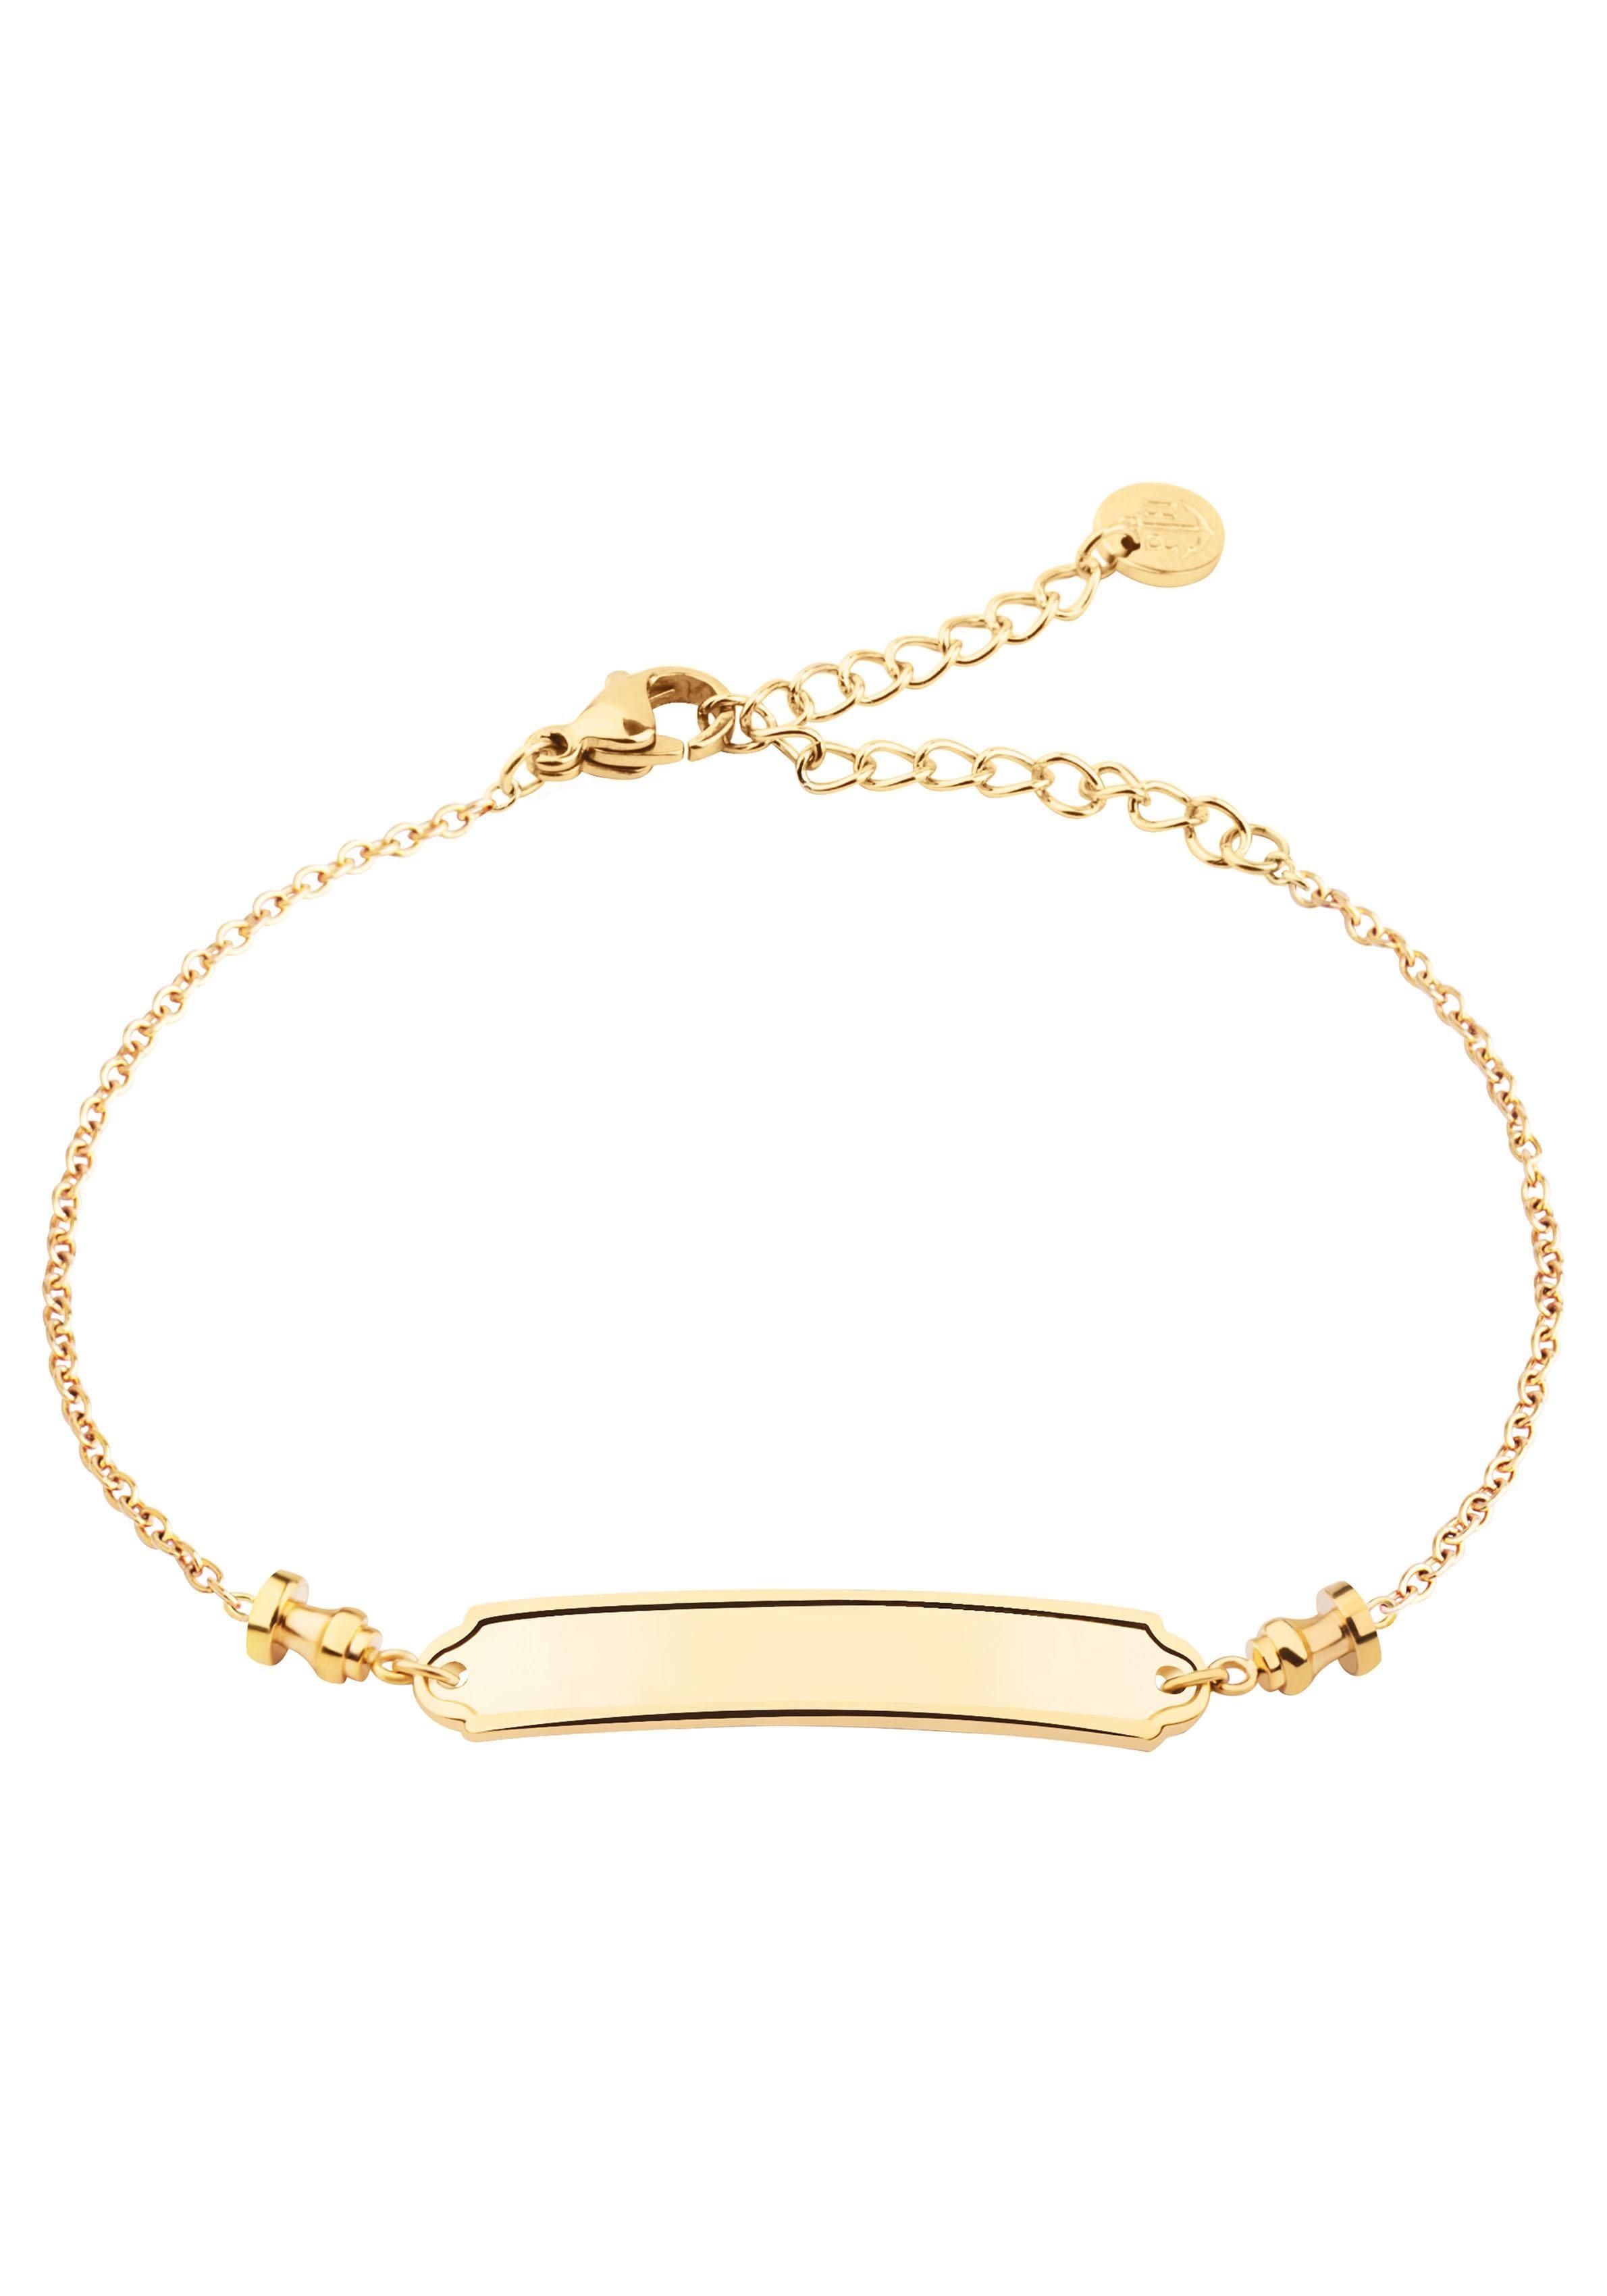 PAUL HEWITT Armband Armkette Pier IP Gold PH-B-PC-BL-G | Schmuck > Armbänder > Goldarmbänder | Paul Hewitt